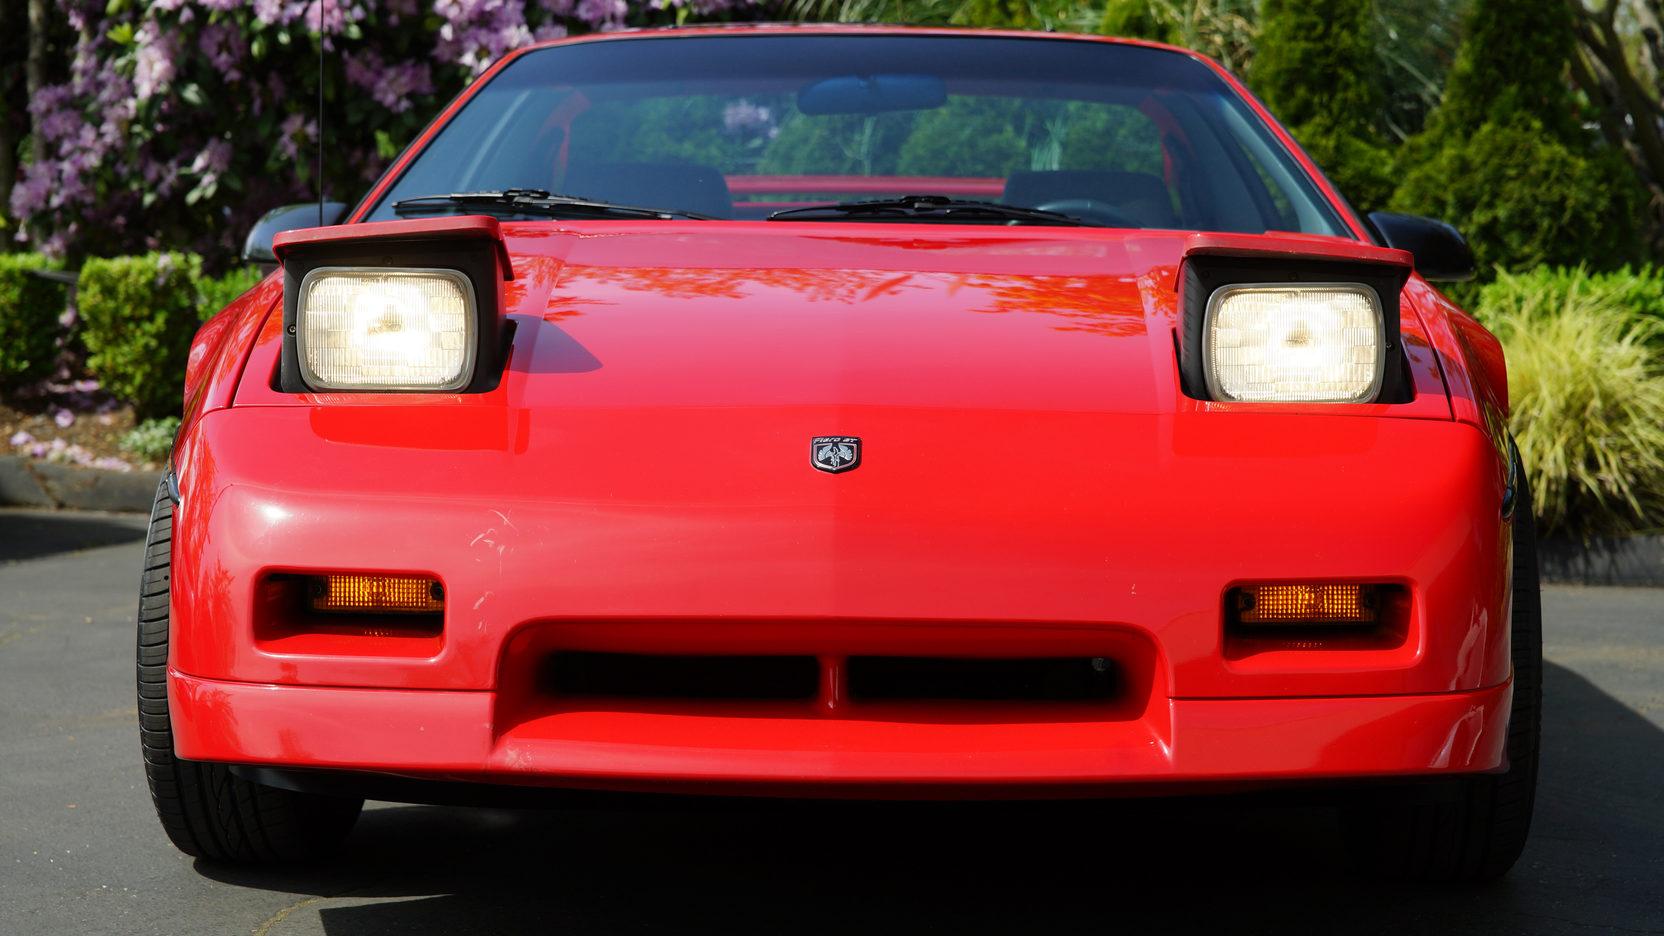 1986 Pontiac Fiero GT front